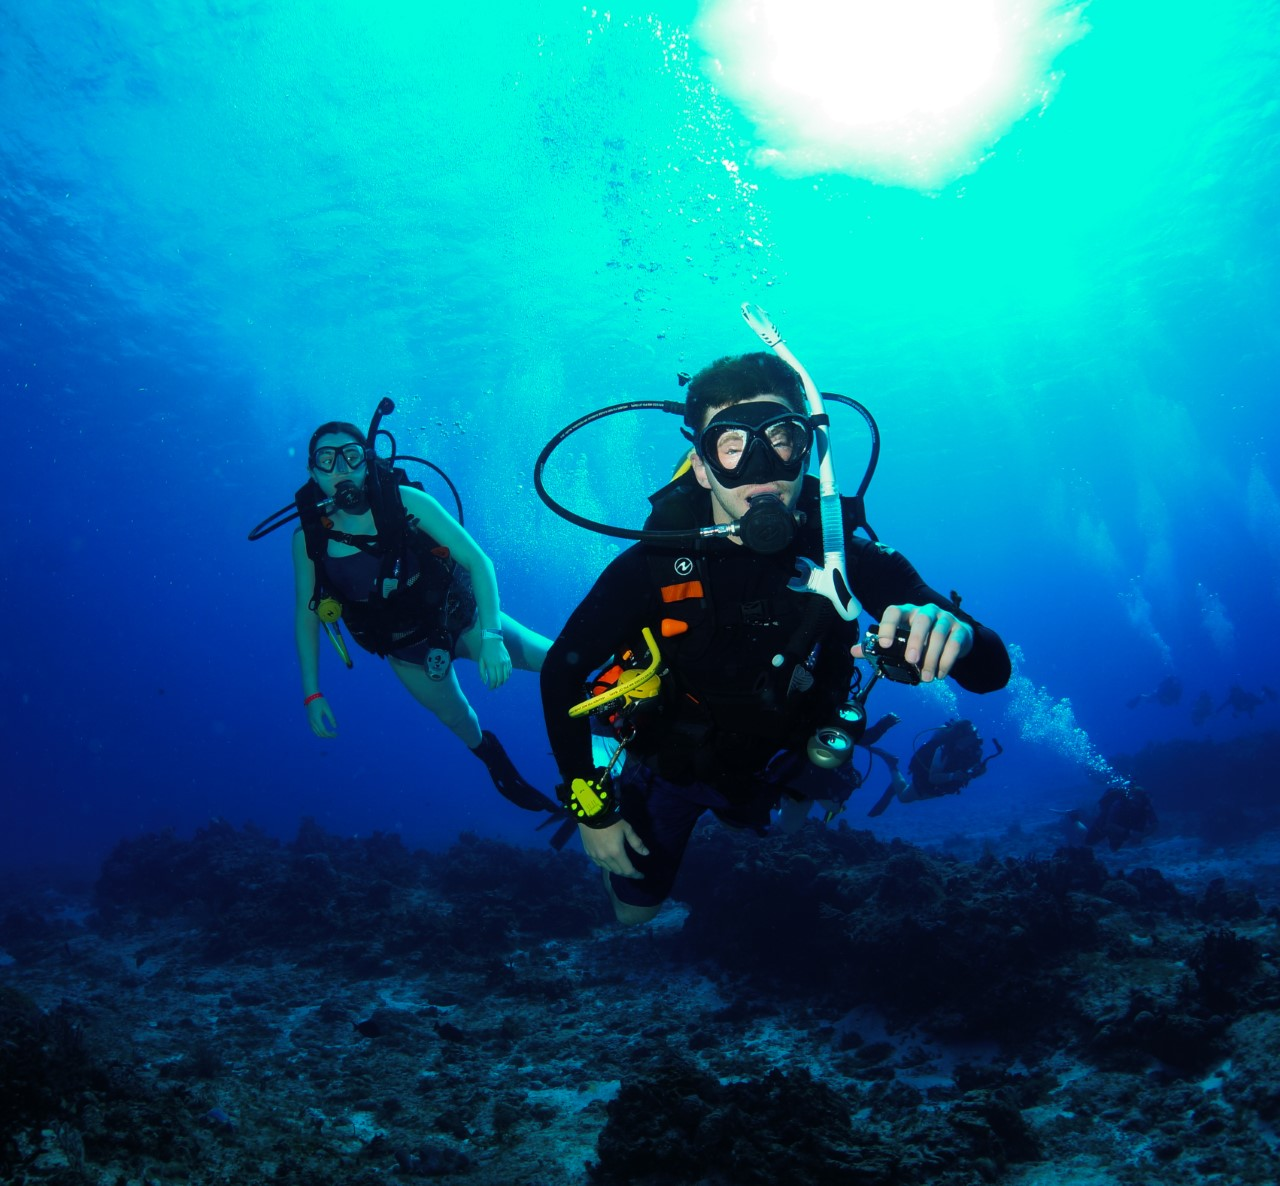 Auburn students Randall Dunlap and Kelly Burnham scuba diving